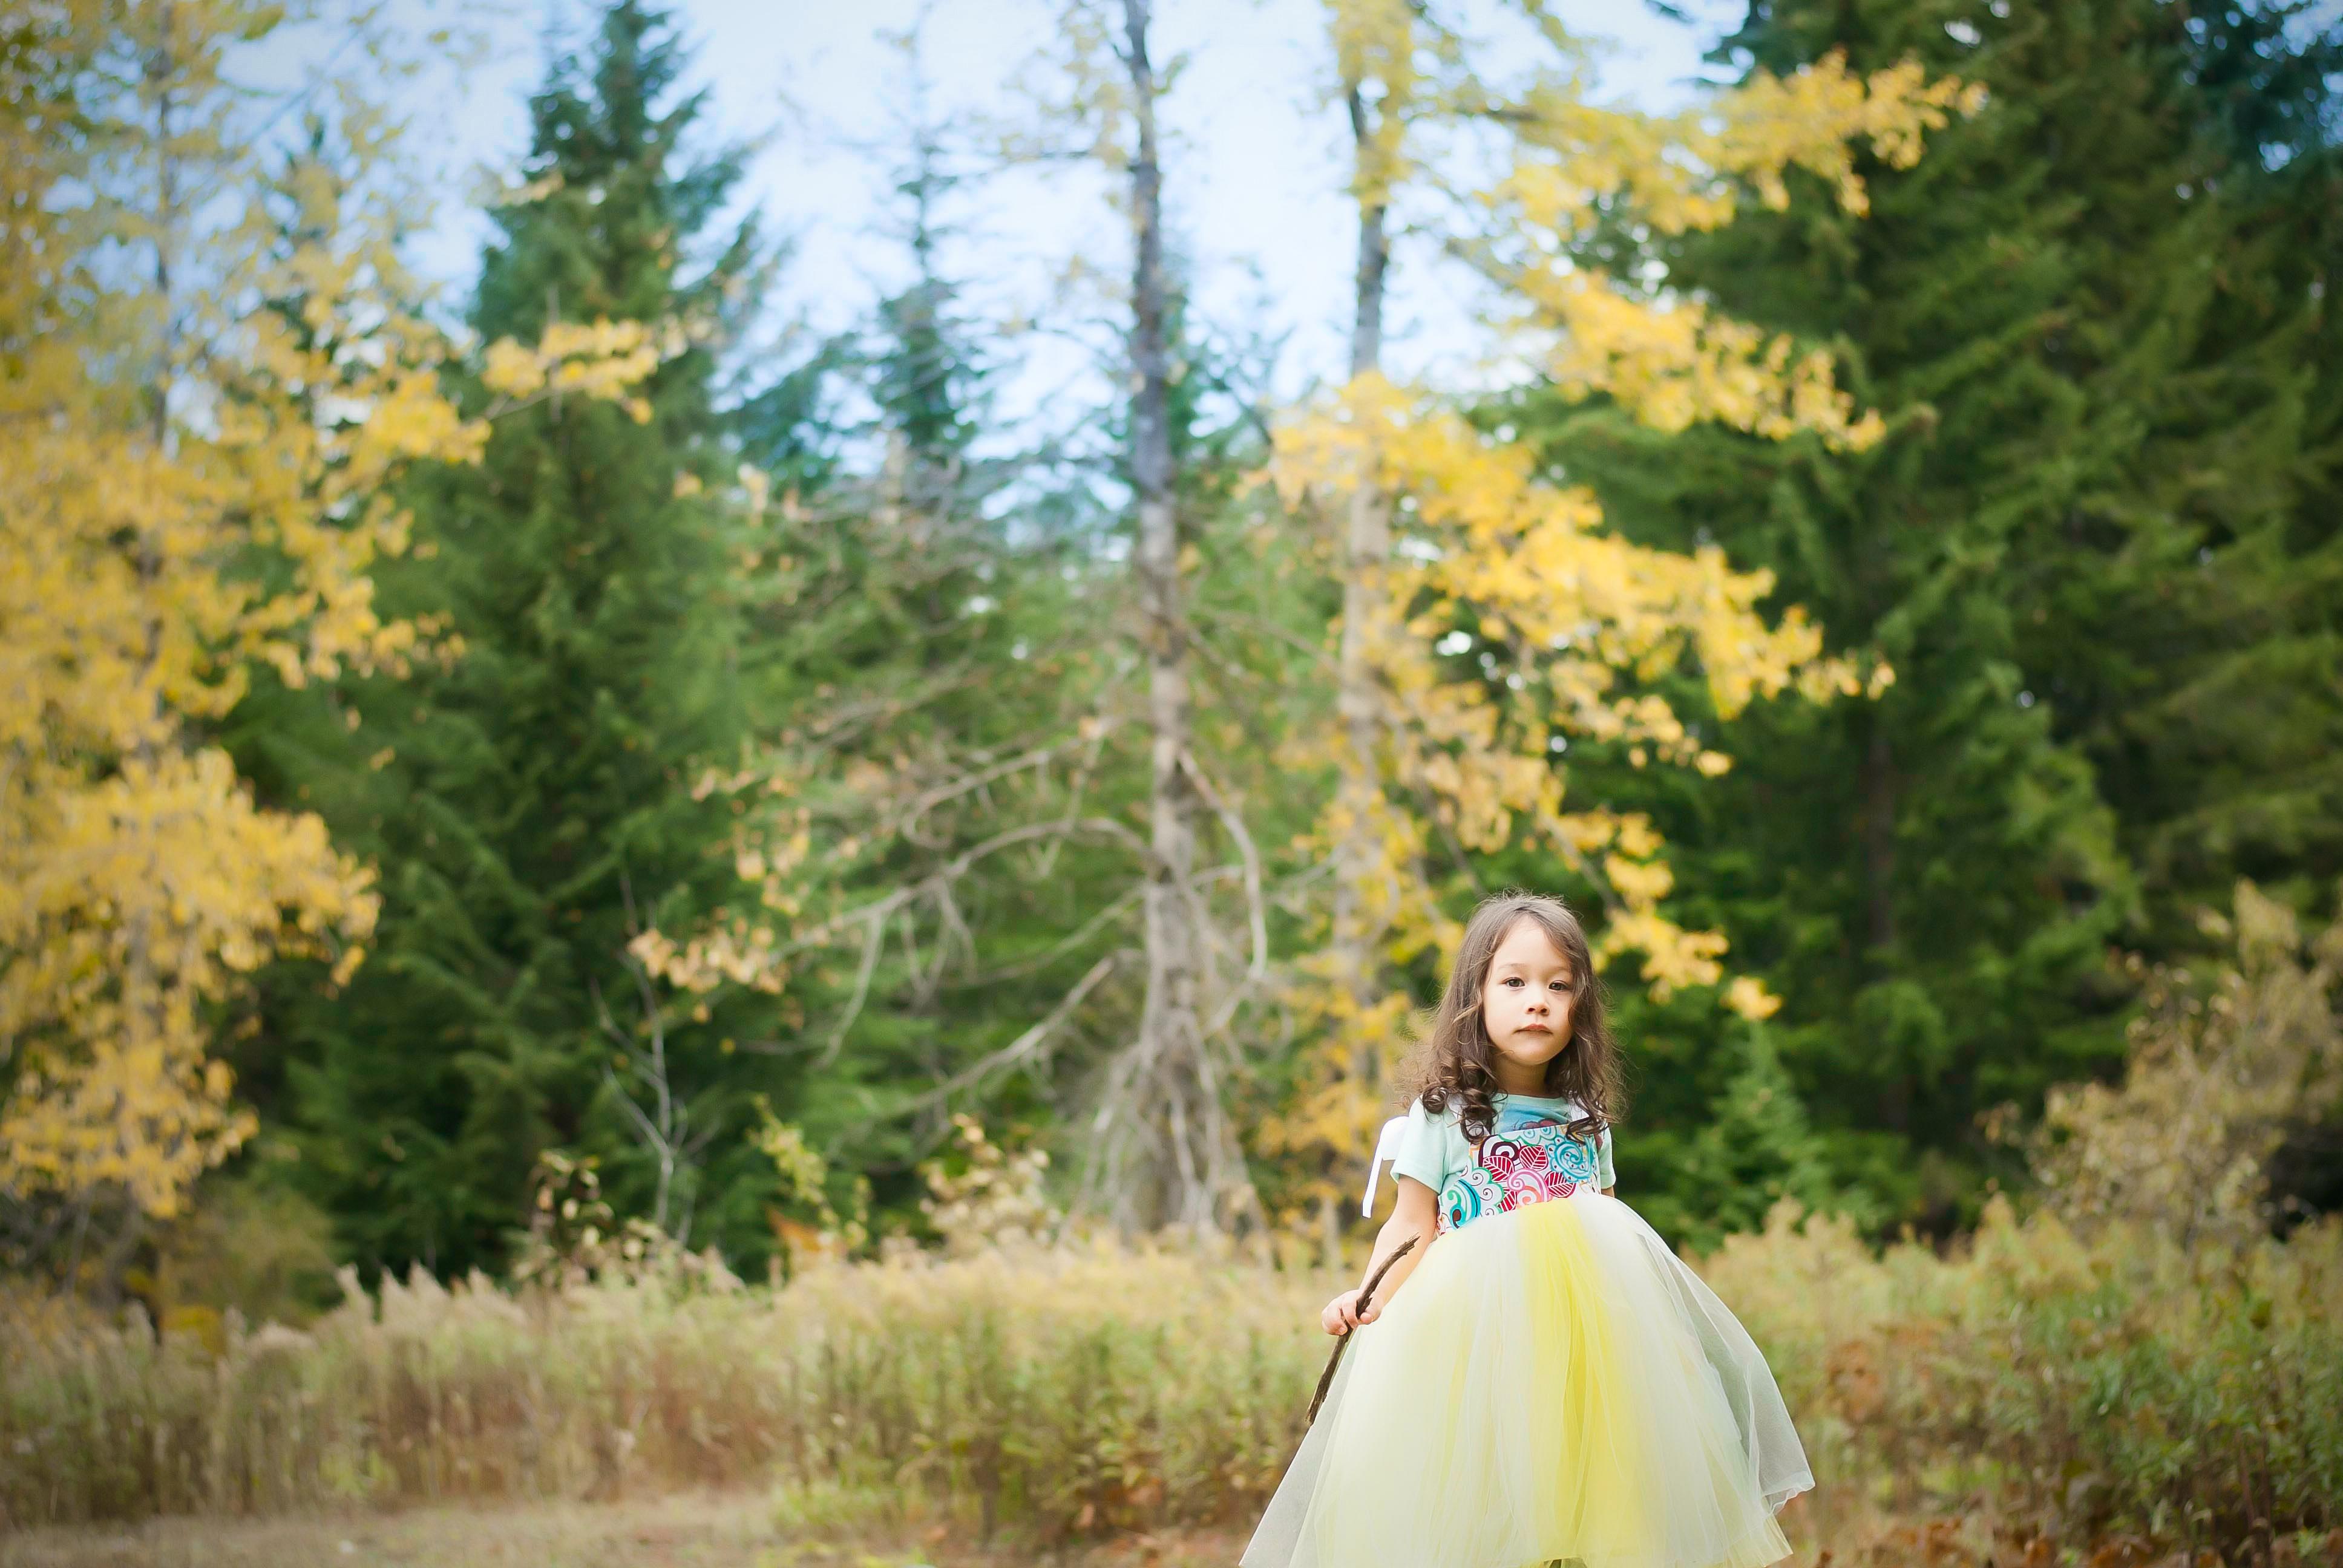 rio-jean-photography-holiday-portraits-child-photographer-kent-wa-bonney-lake-wa-children-portrait-photographer